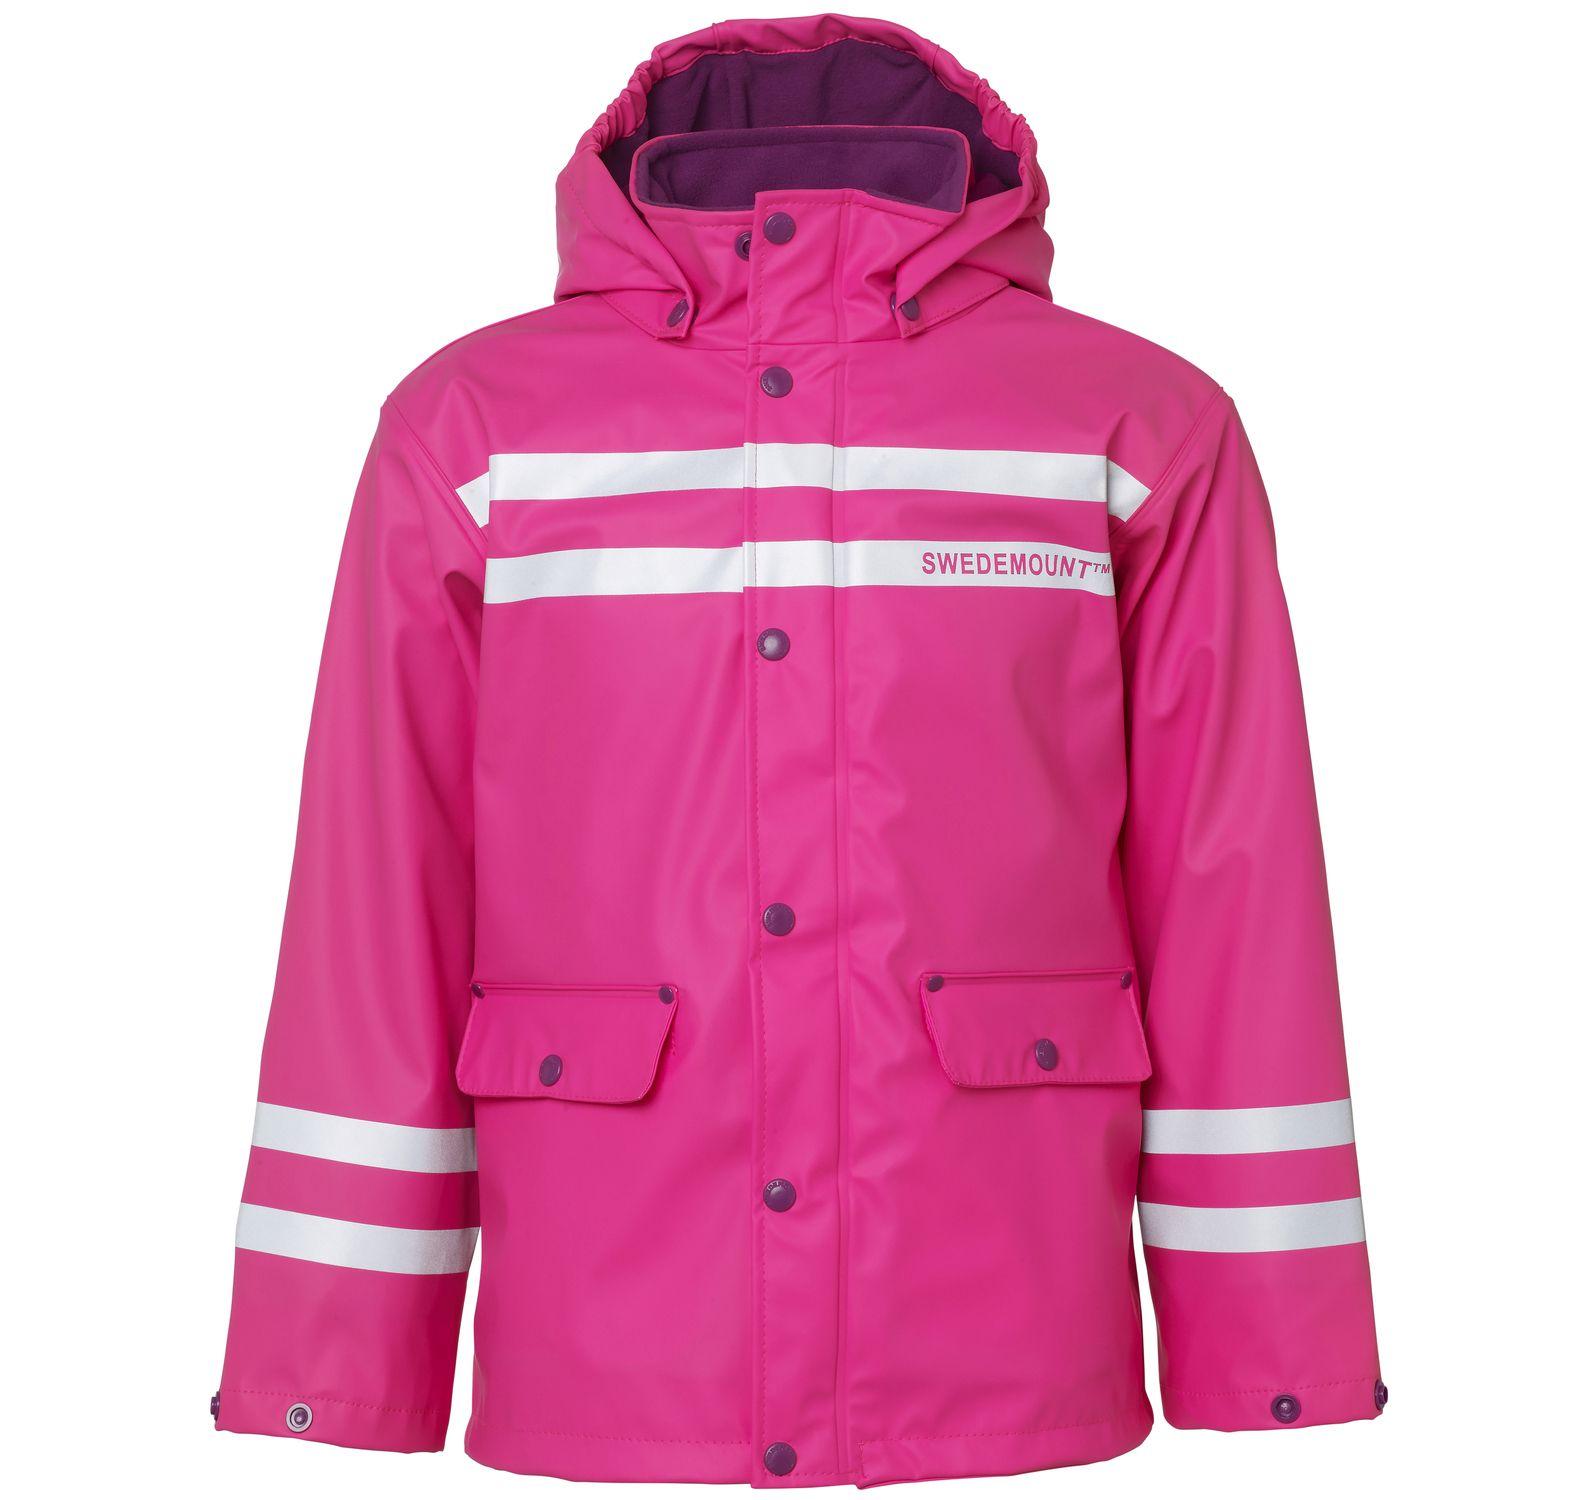 Iceflake Rain Jacket, Pink, 140, Regnkläder